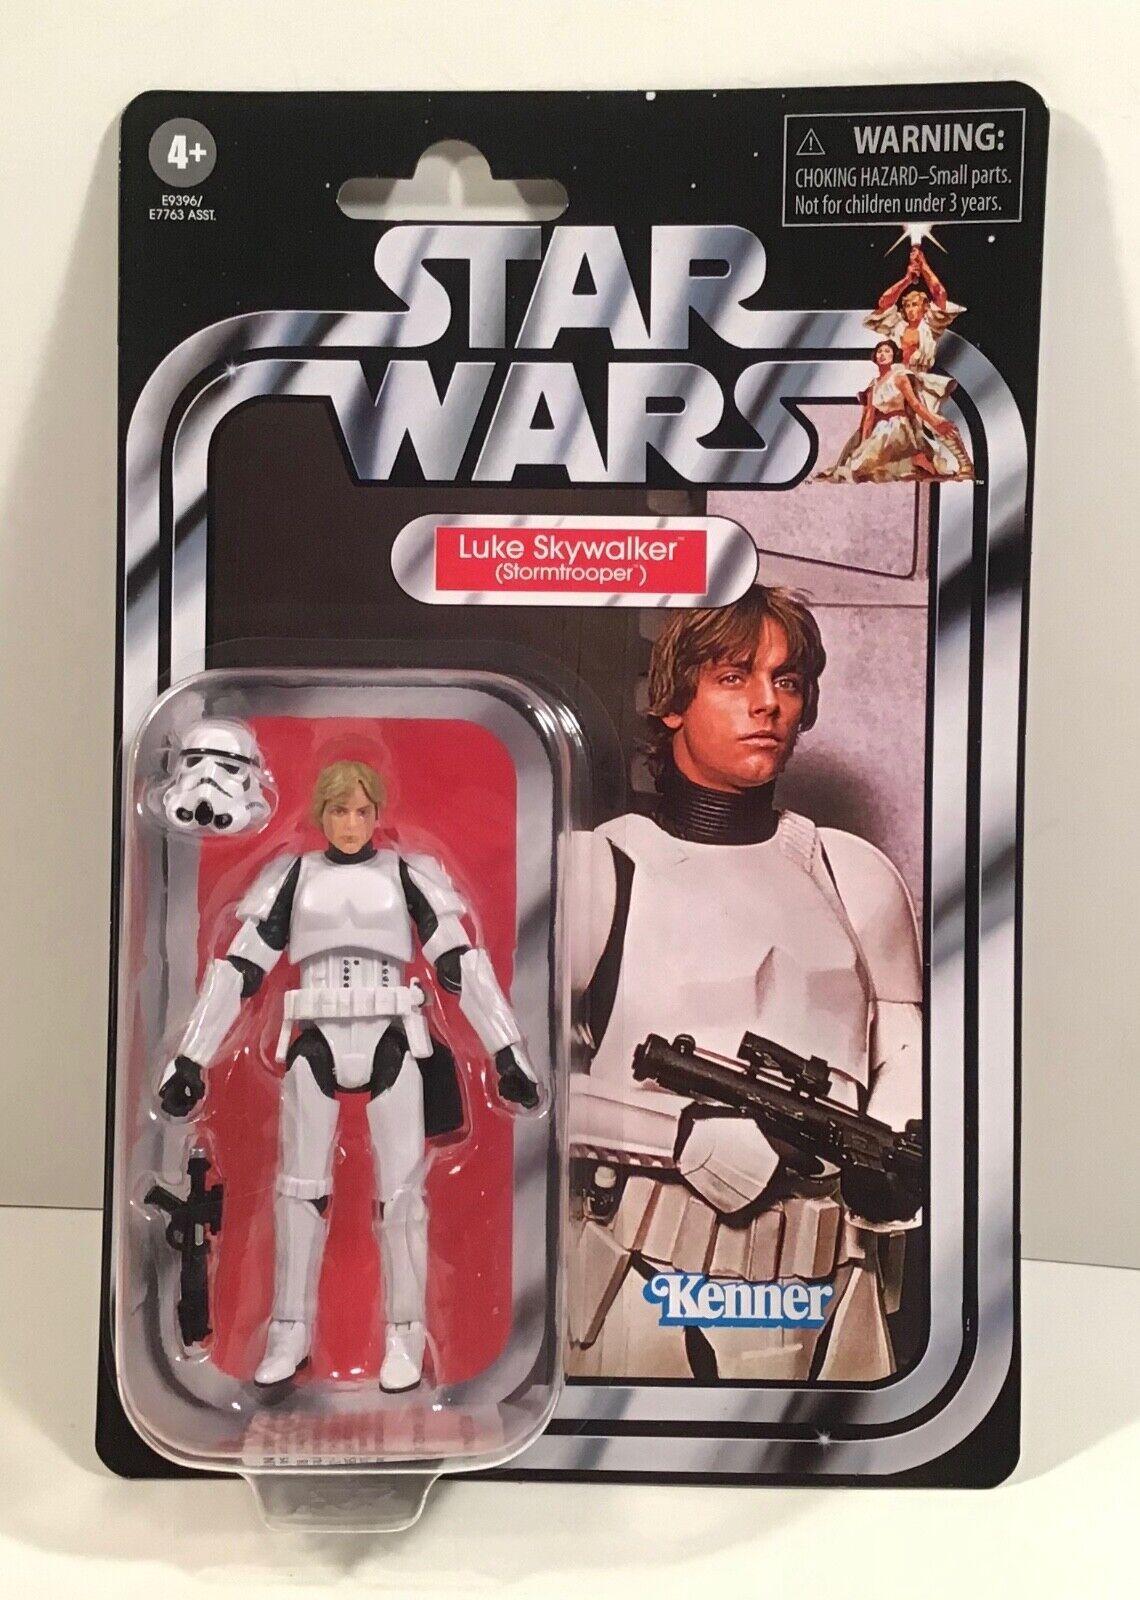 STAR Wars Luke Skywalker Stormtrooper VINTAGE COLLECTION VC169 Action Figure Nuovo